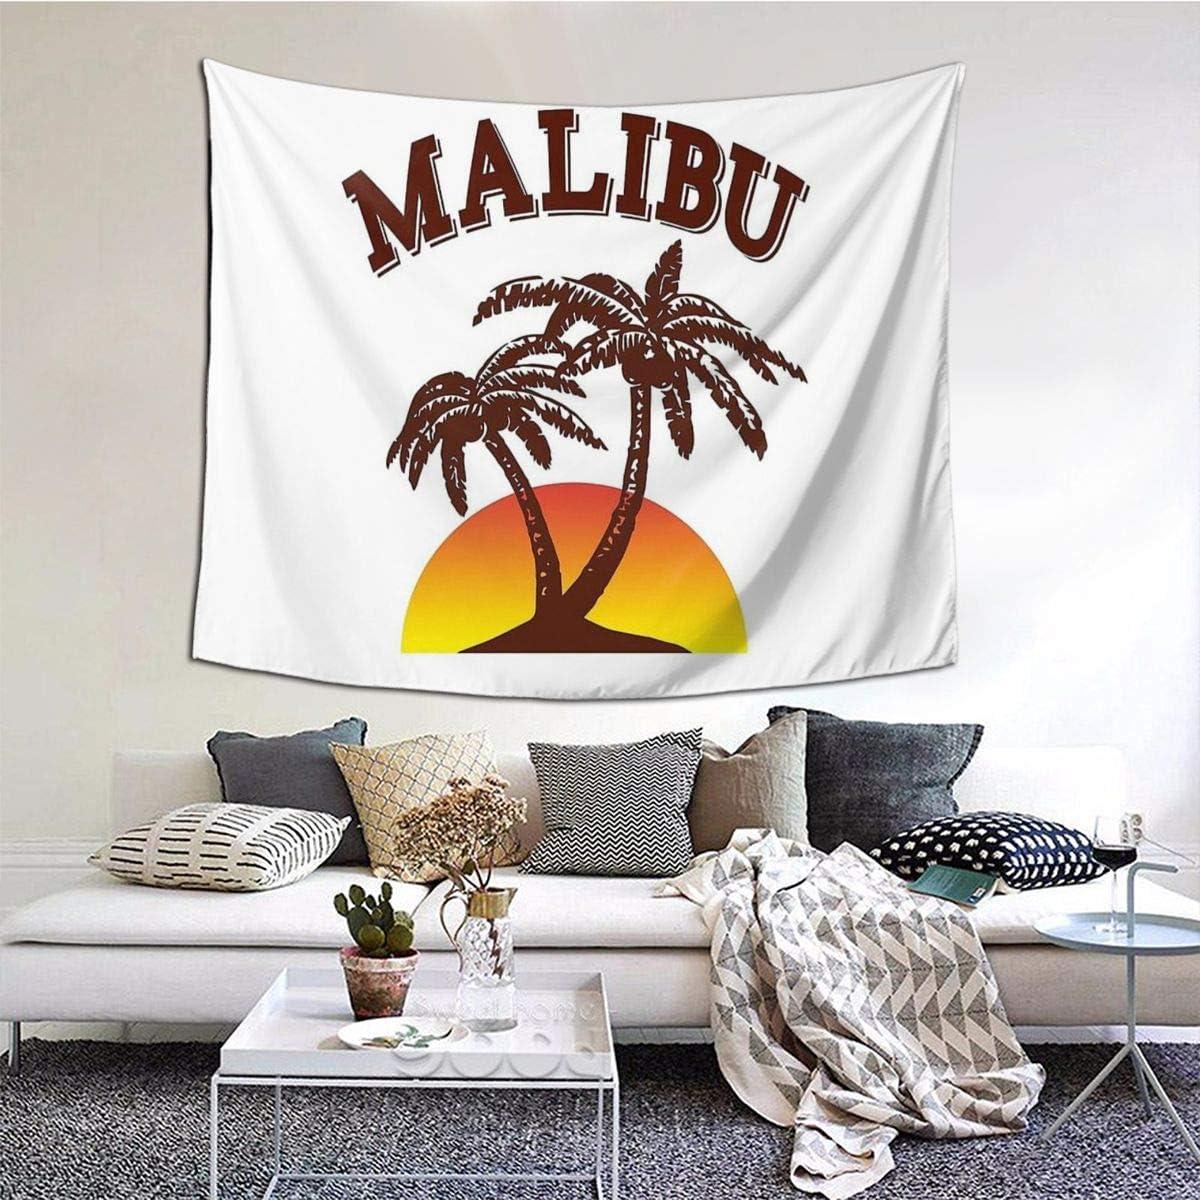 Malibu Rum Home Decor Art Wall Hanging Bedroom Living Room Dorm Tapestry 60 X 51 Inch